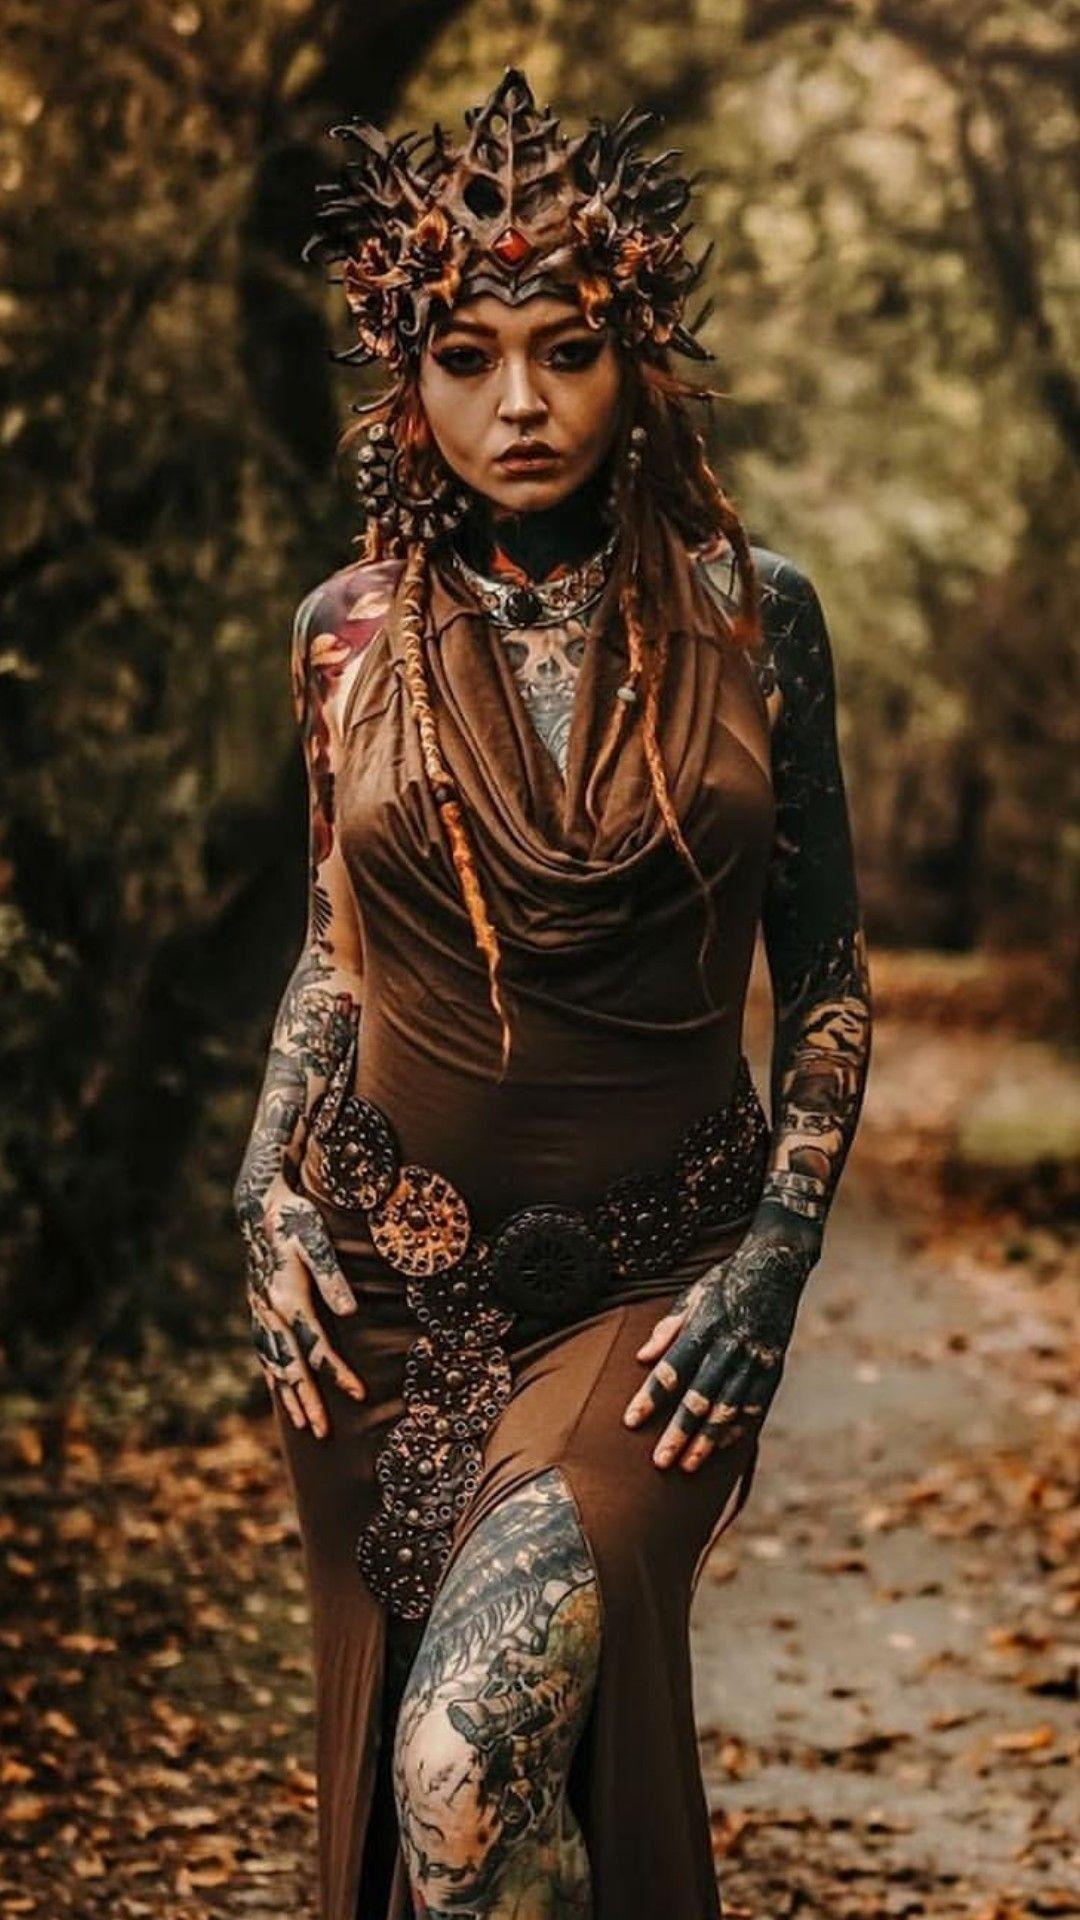 , bohemiskstilhår in 2020 Warrior woman, Inked girls